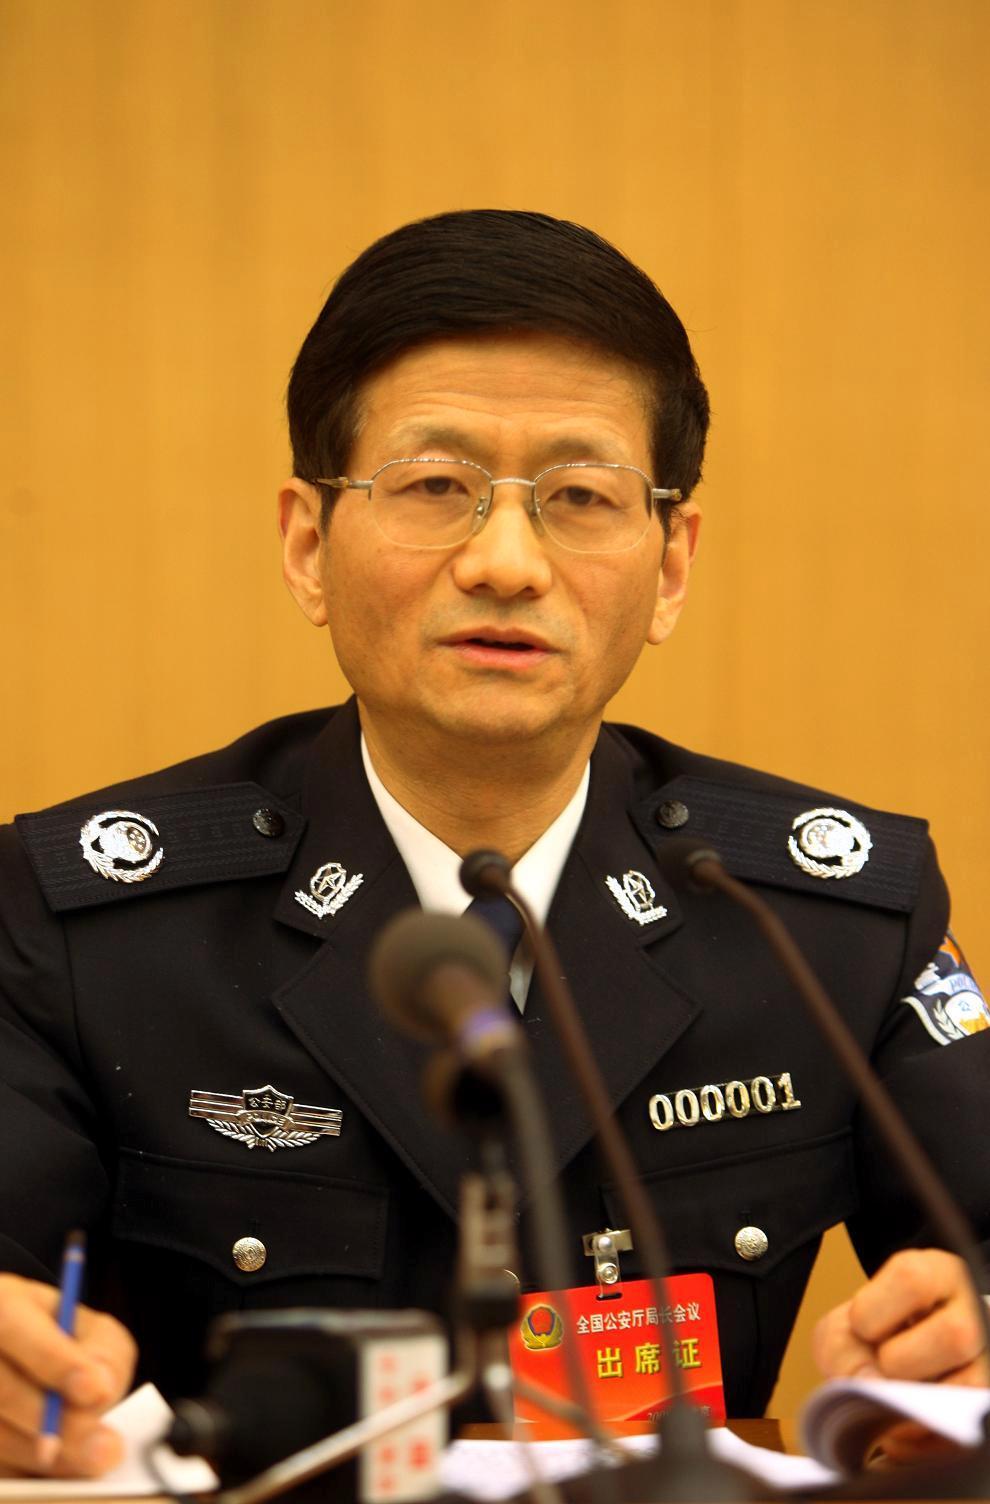 http://images.ccoo.cn/bbs/201185/20118516470425.jpg